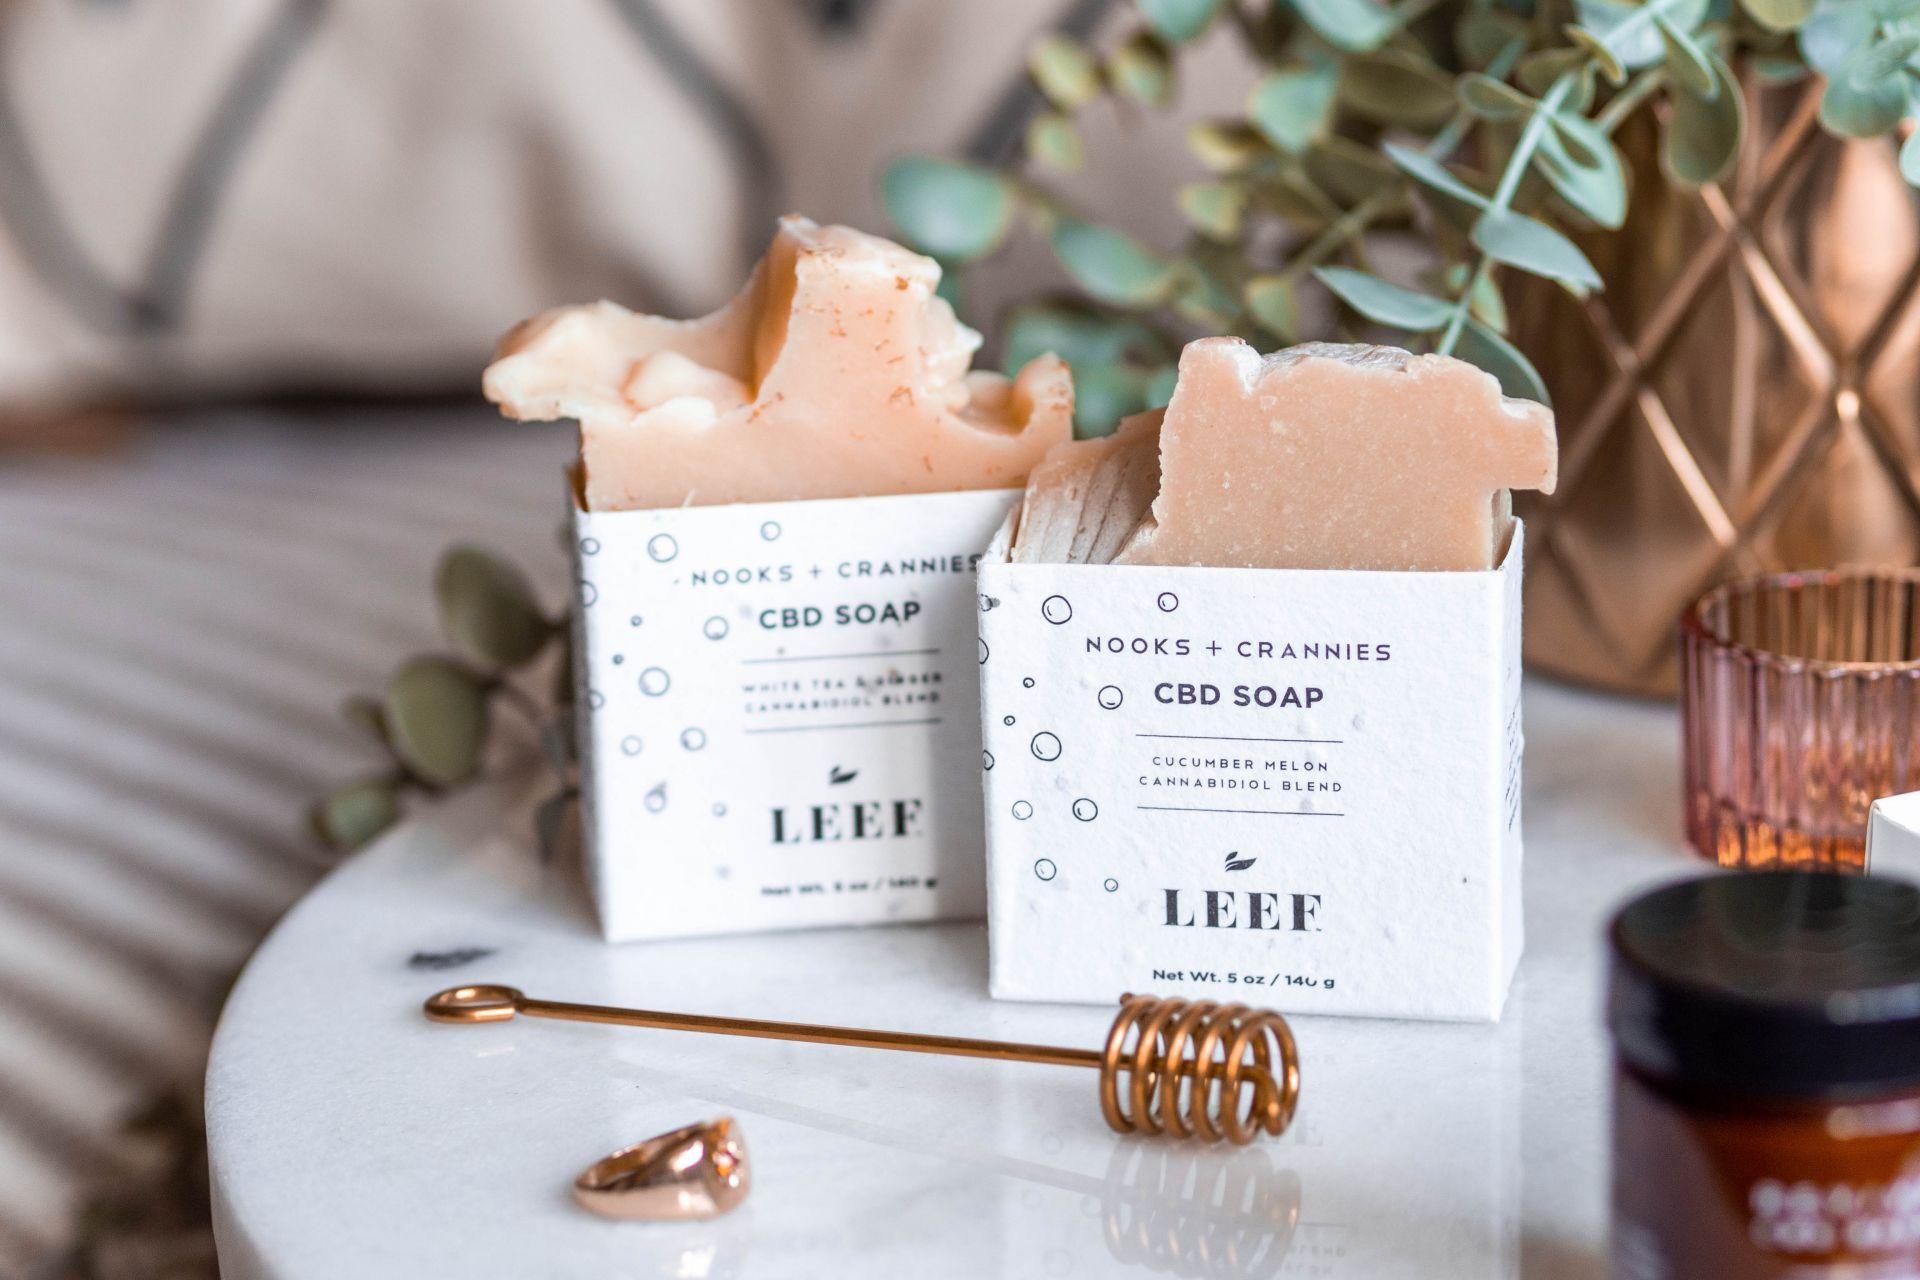 Leef Organics Nooks & Crannies Soaps